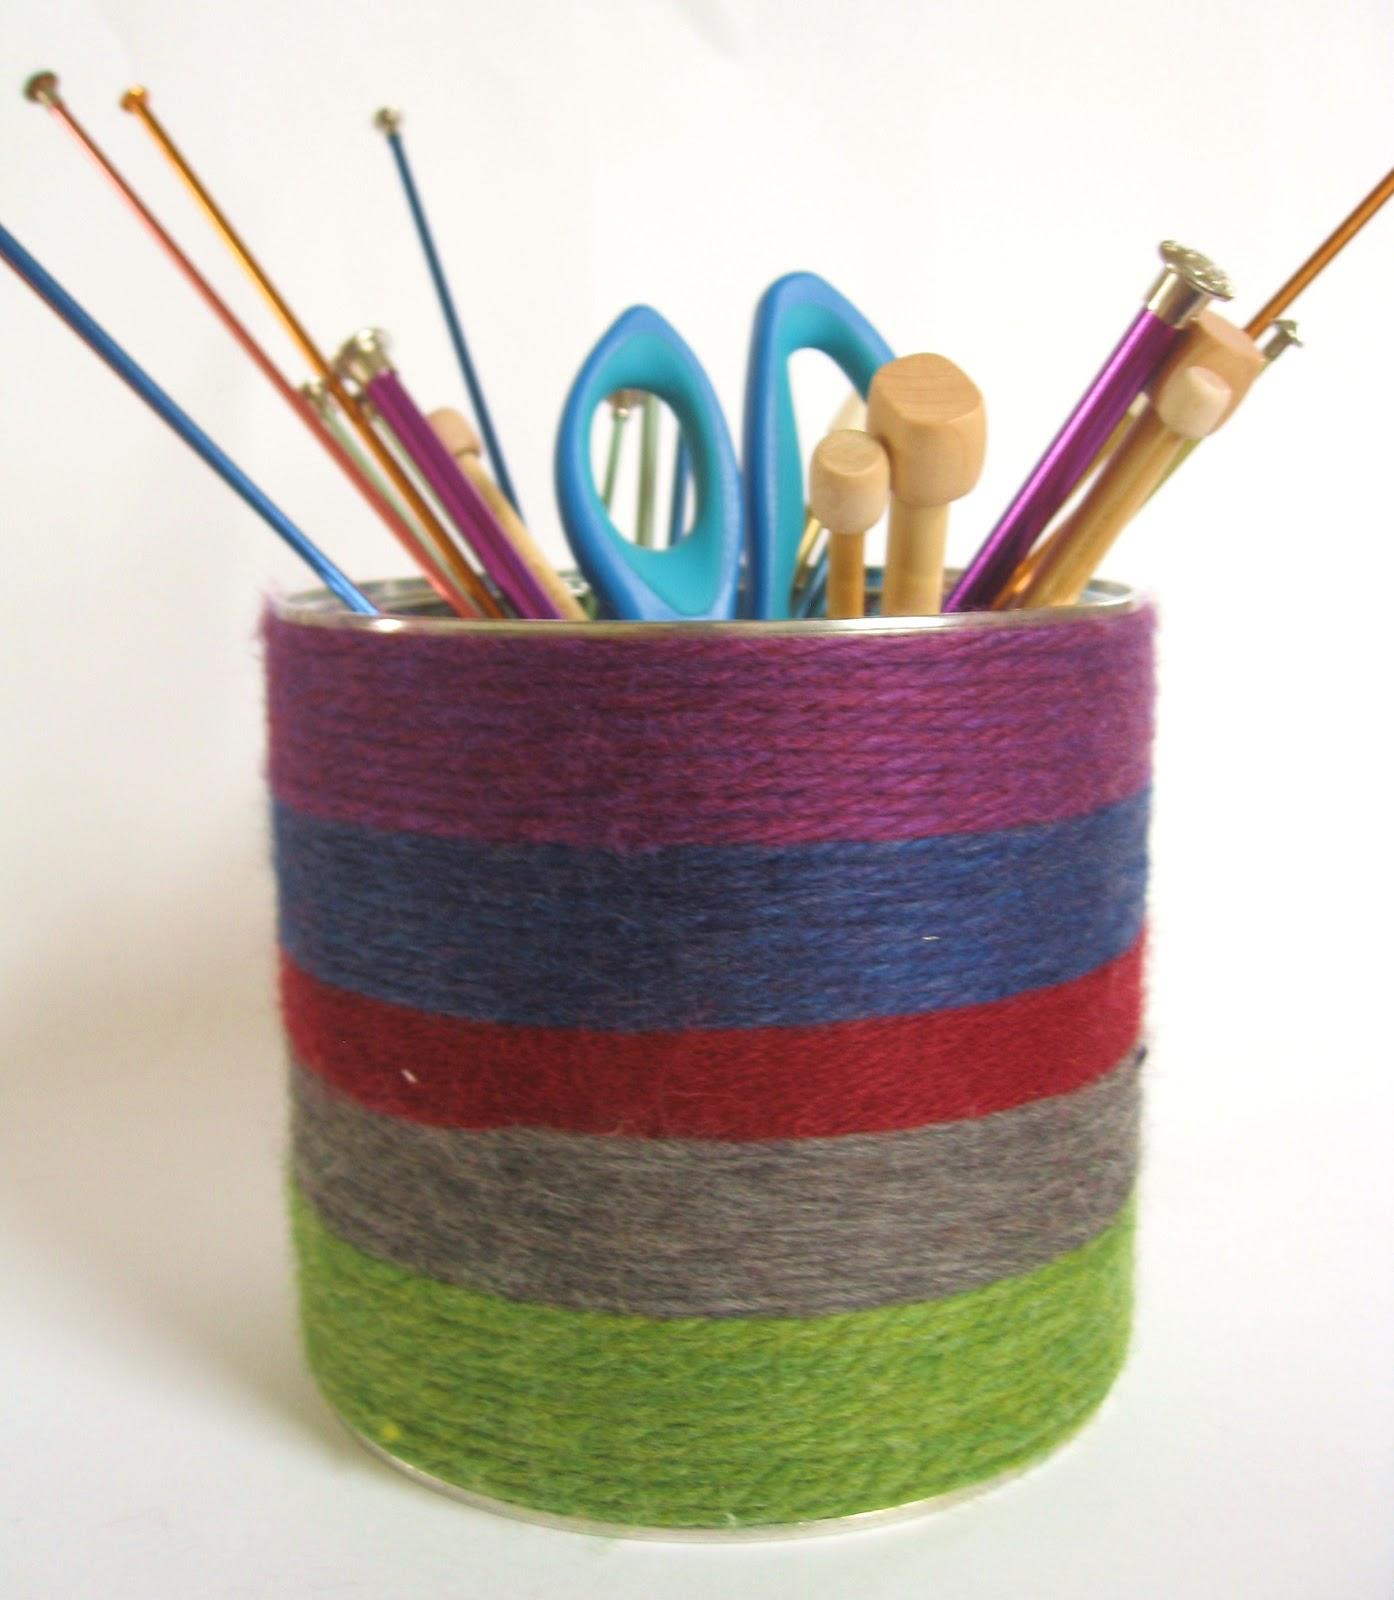 Megan E Sass Handknits: DIY: Yarn Wrapped Storage Tin Tutorial